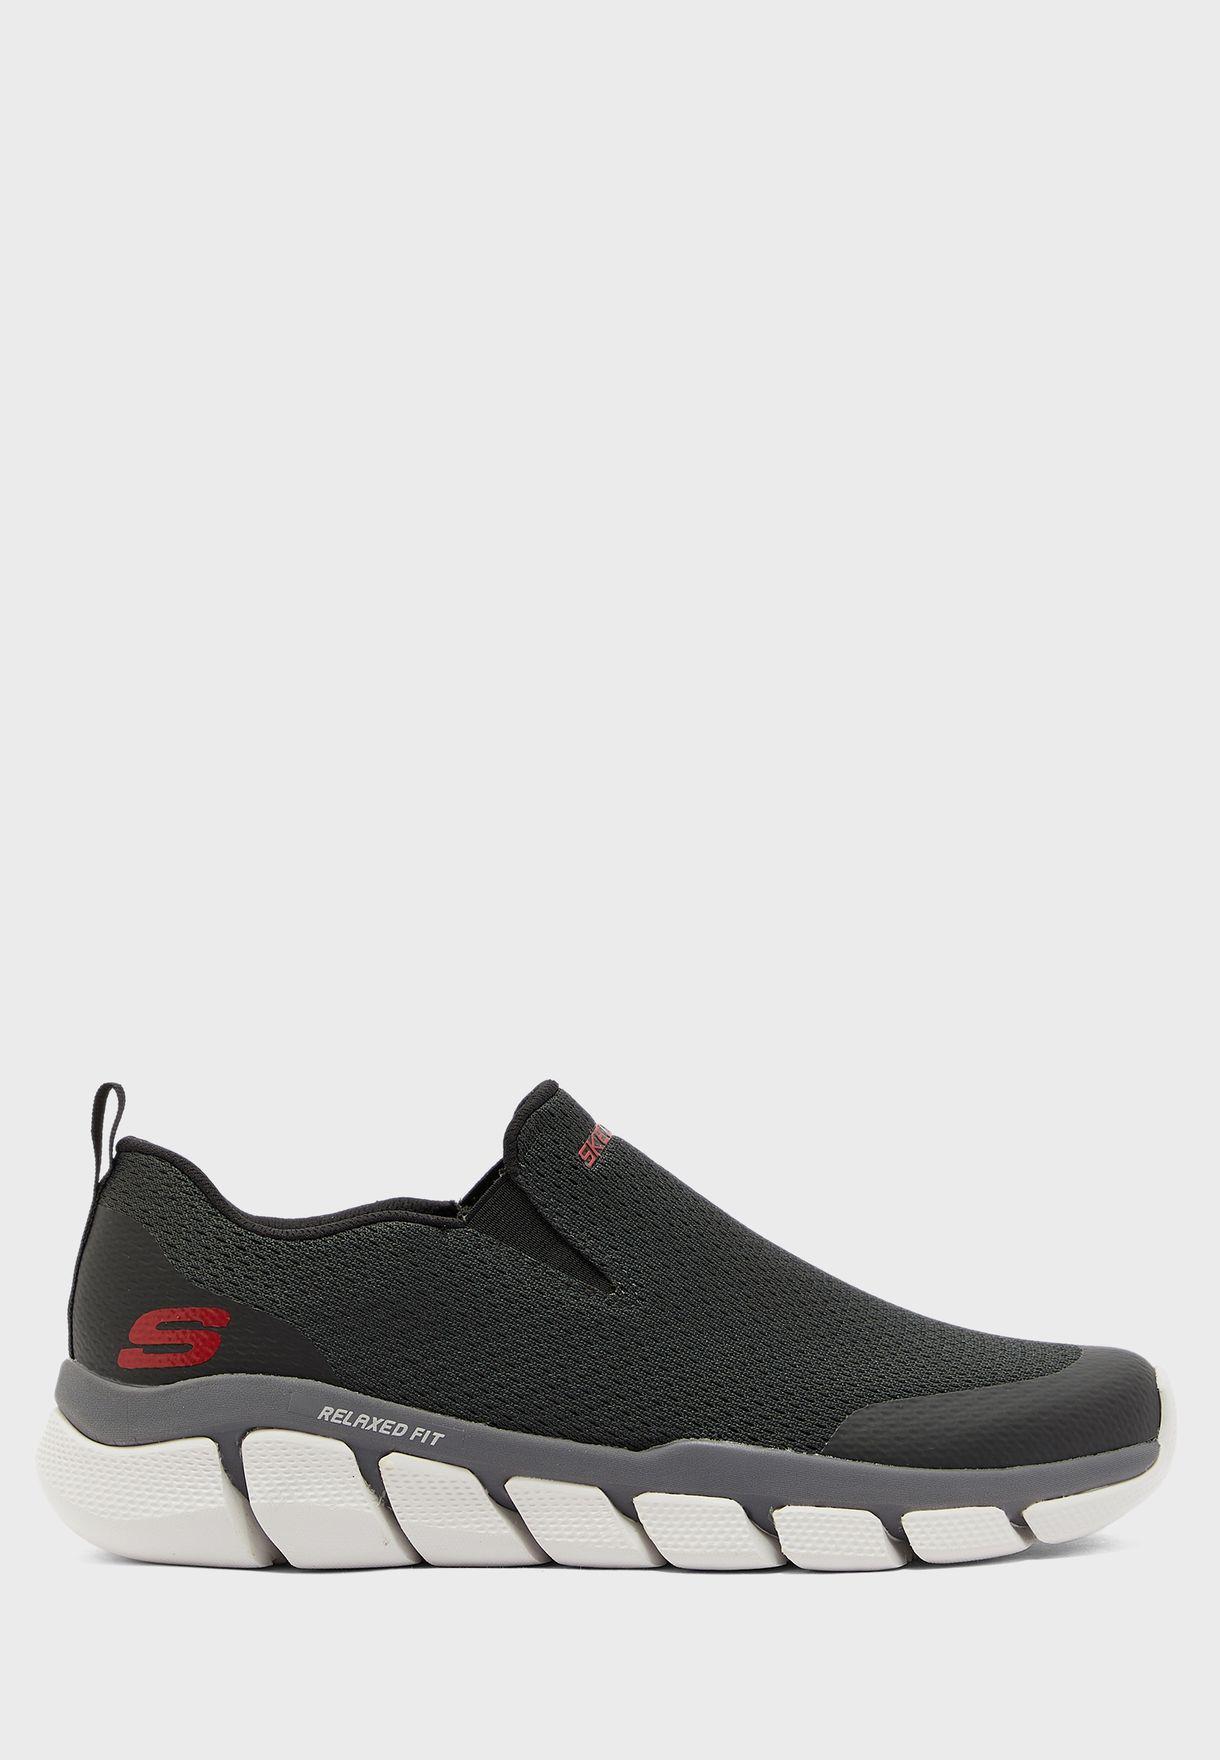 حذاء سكتش فليكس 3.0